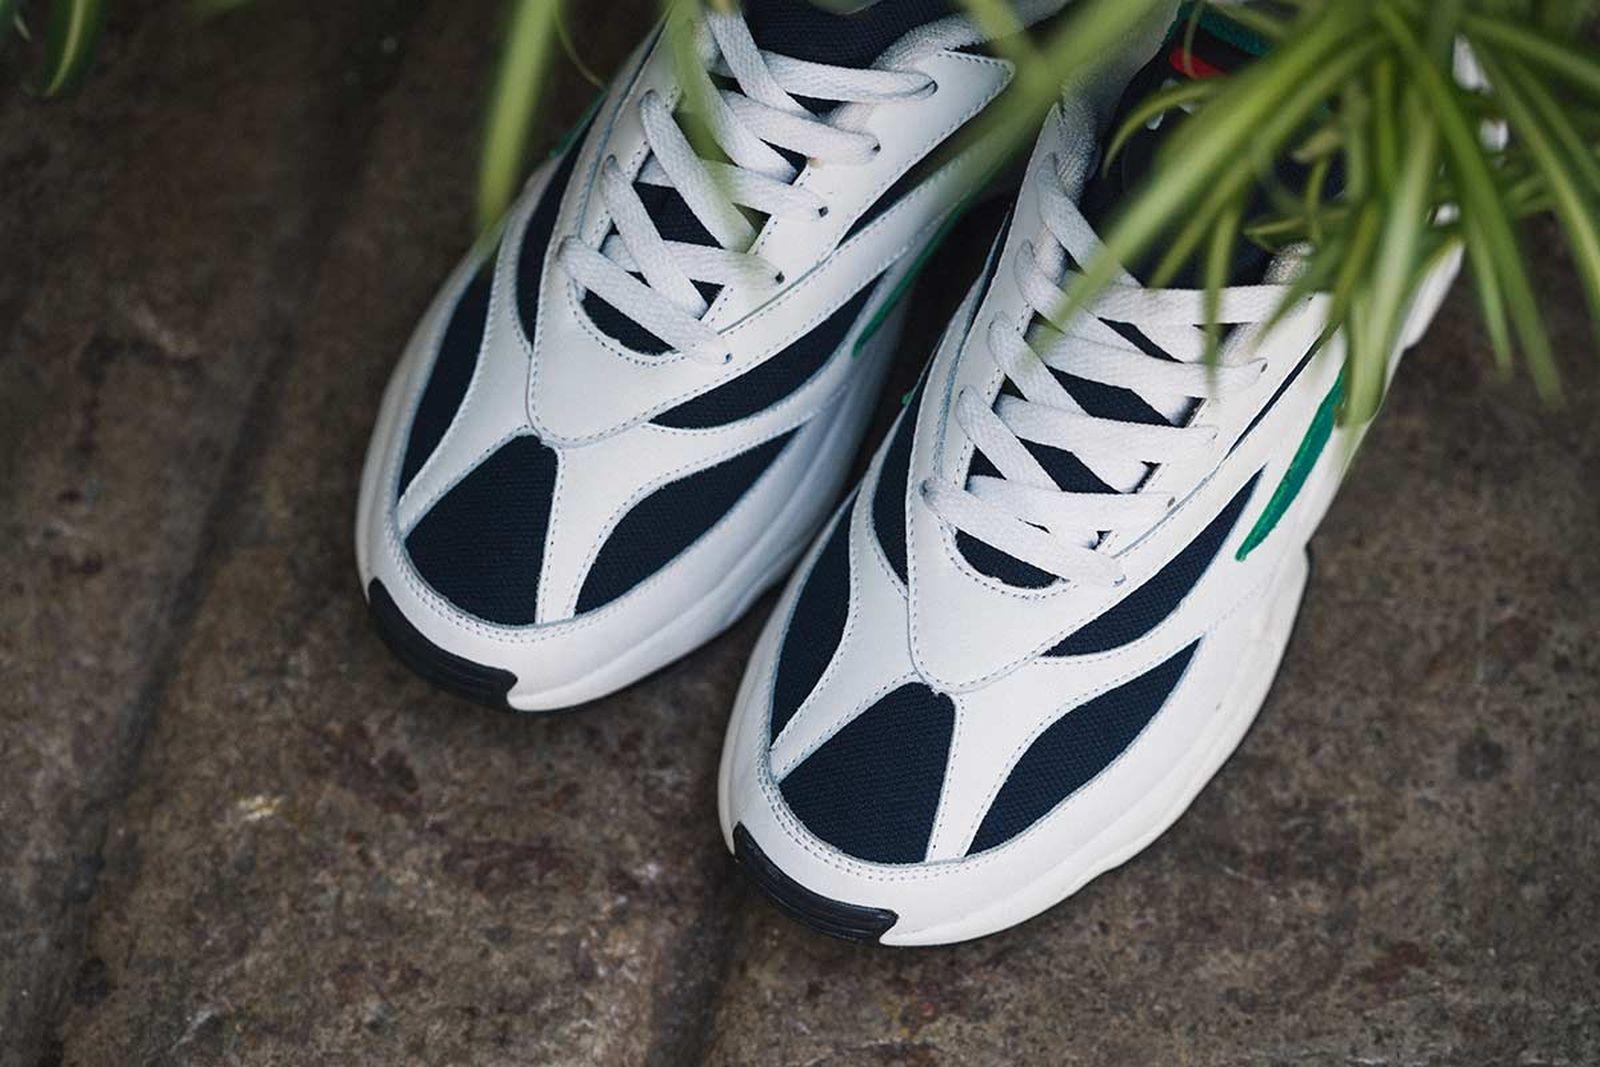 fila-venom-sneakers-release-date-price-07